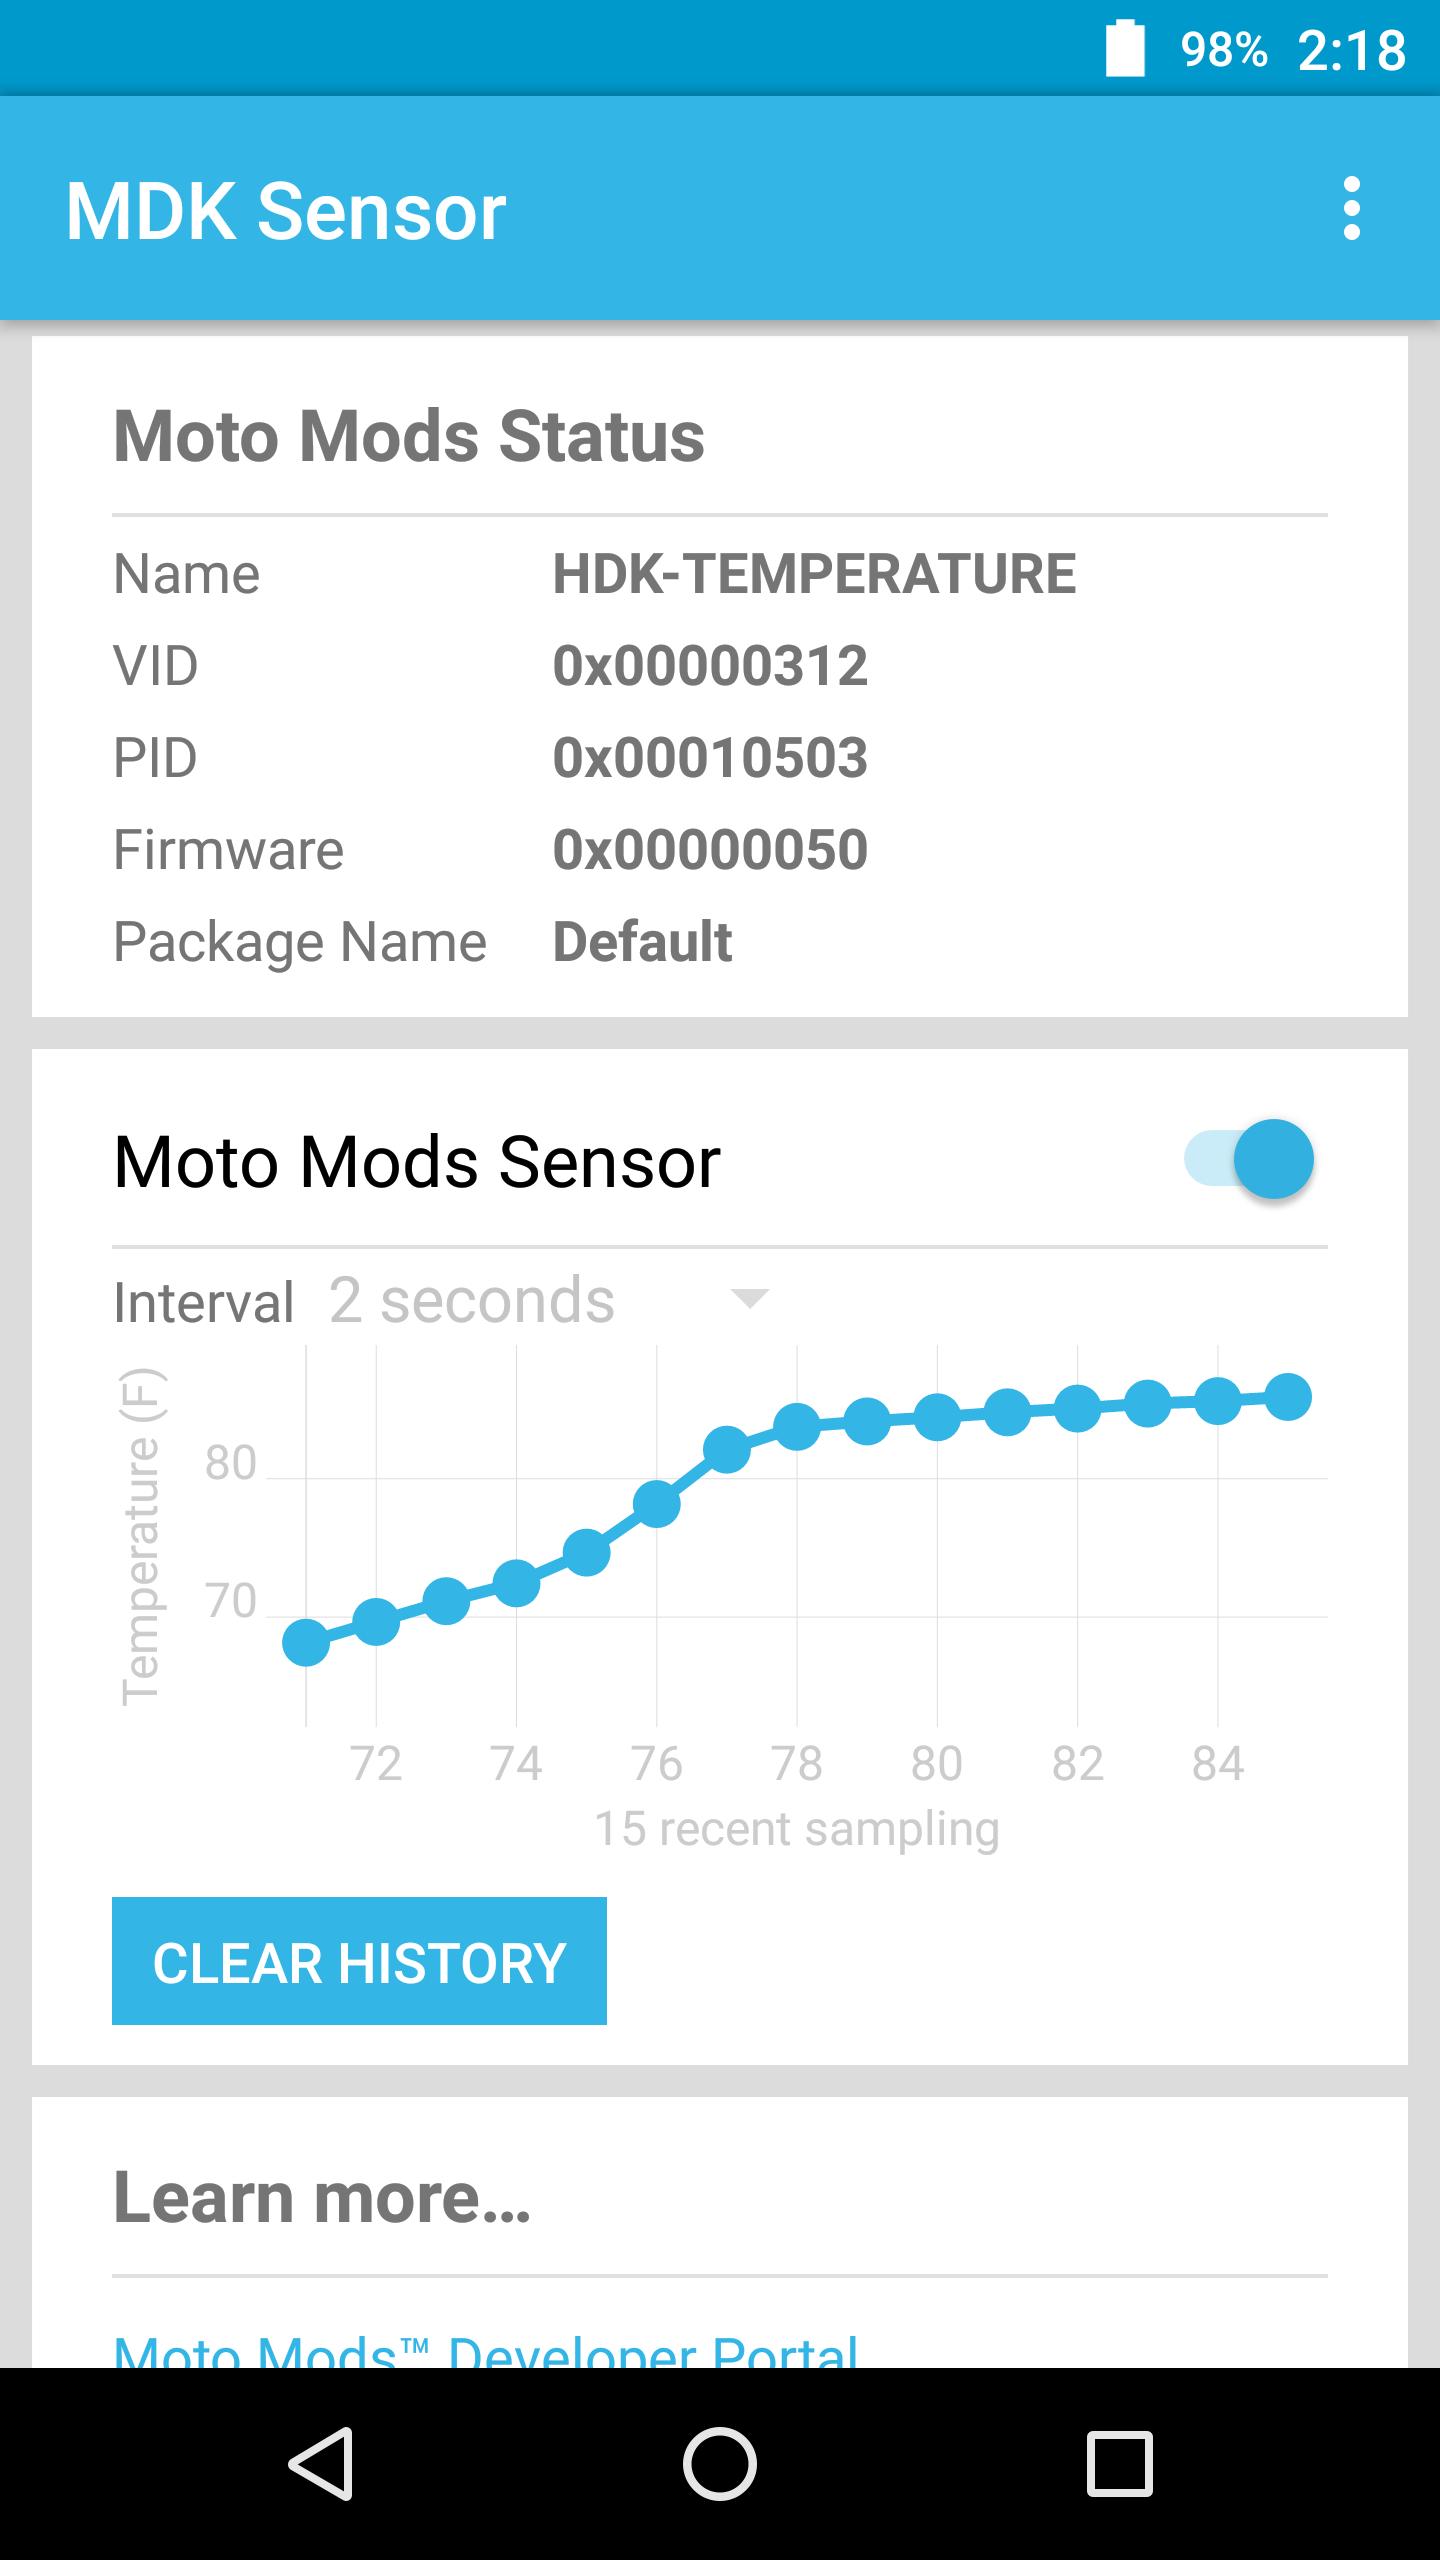 MDK Sensor示例截图